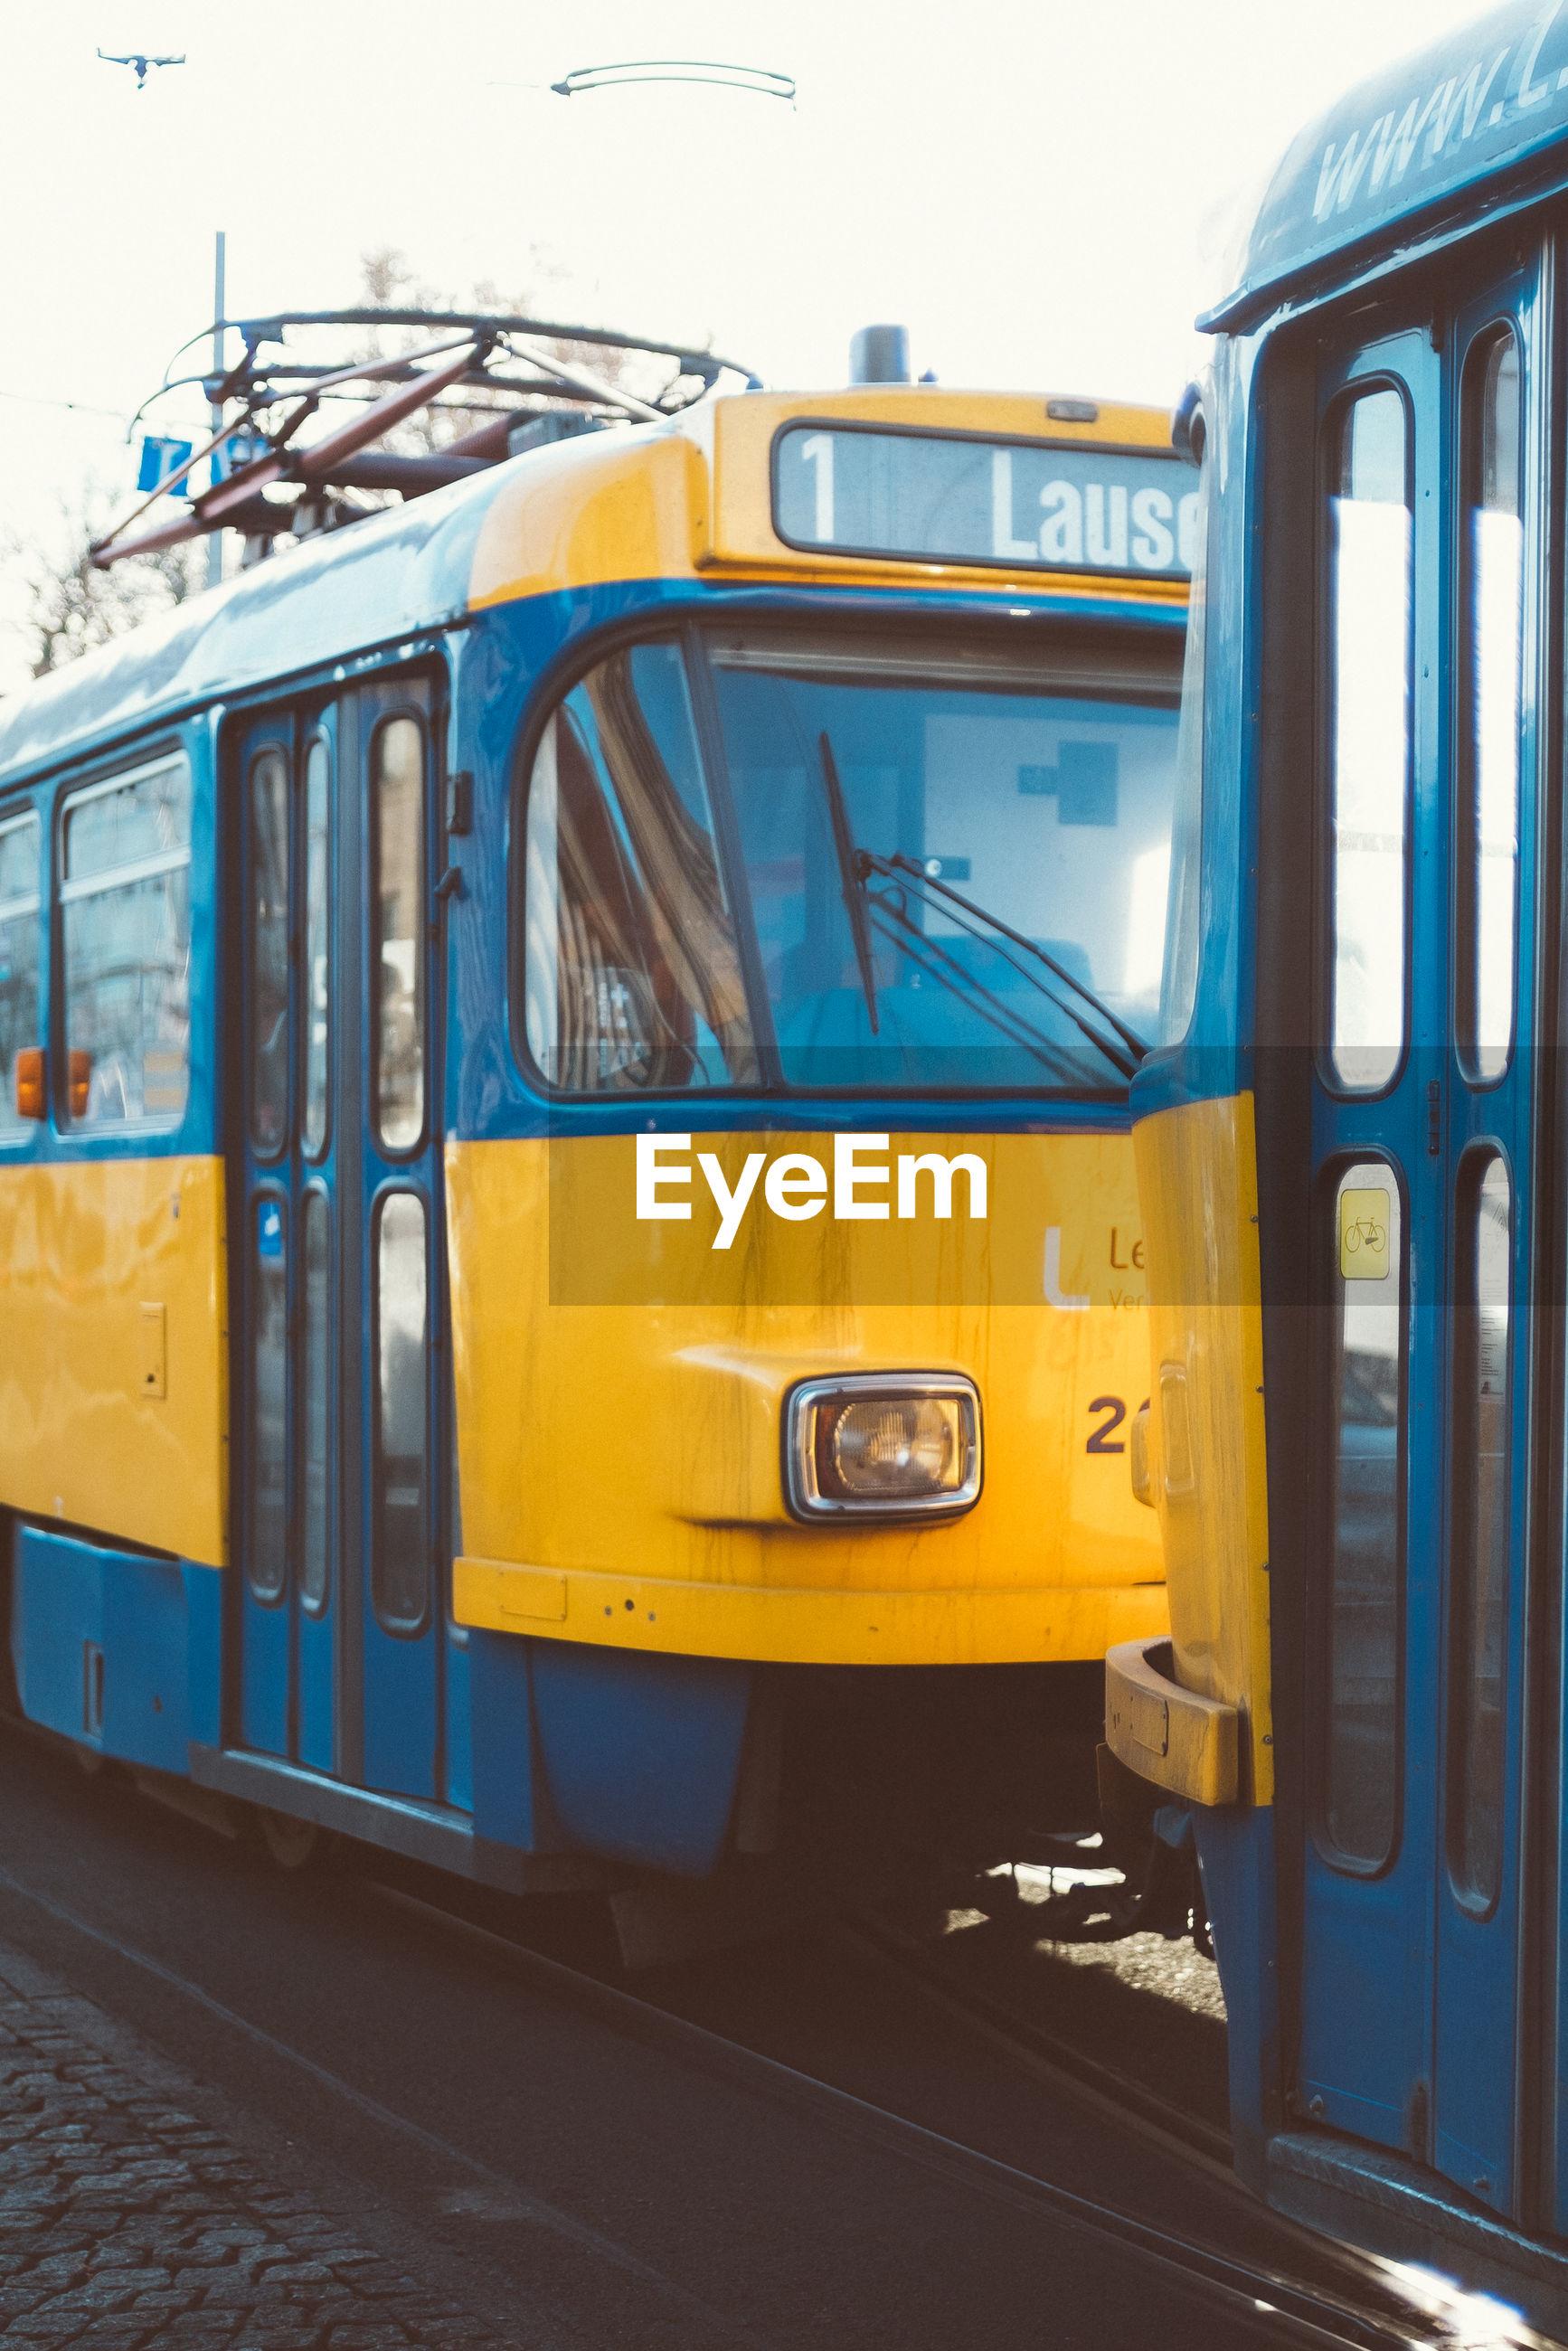 YELLOW TRAIN ON CITY IN RAILROAD TRACKS